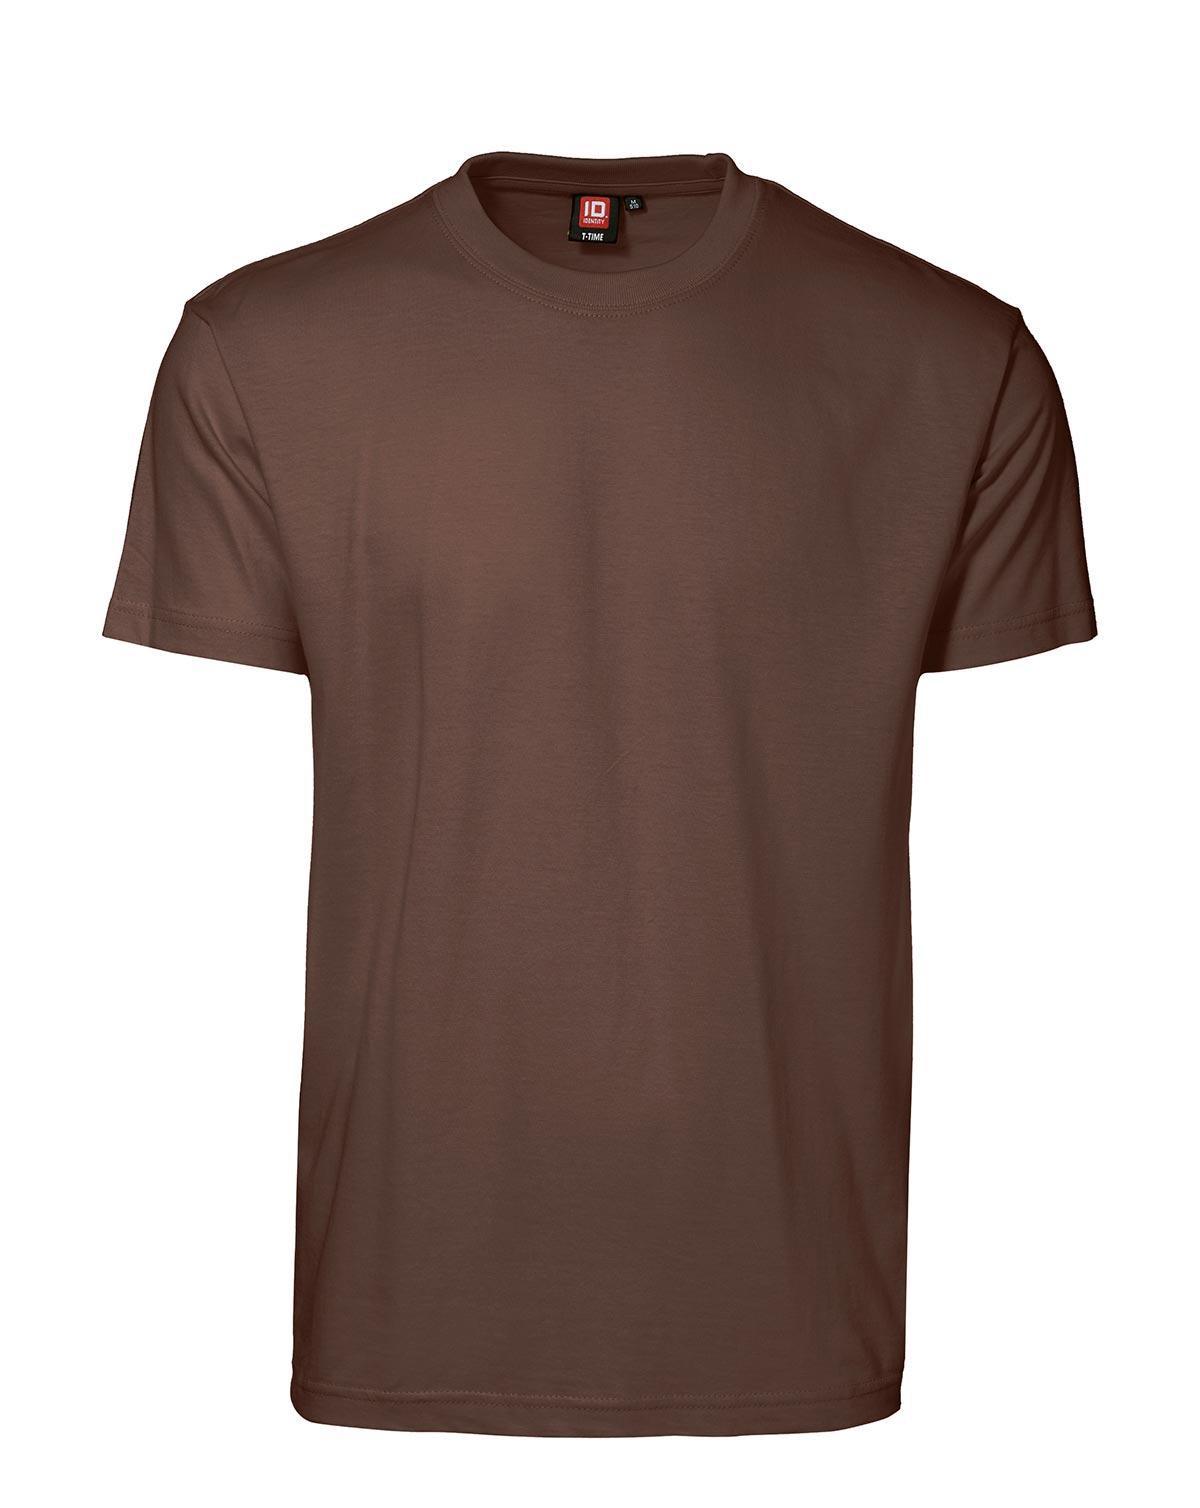 Køb ID T Time T shirt, rund hals | Fri Fragt over 600 |ARMY STAR